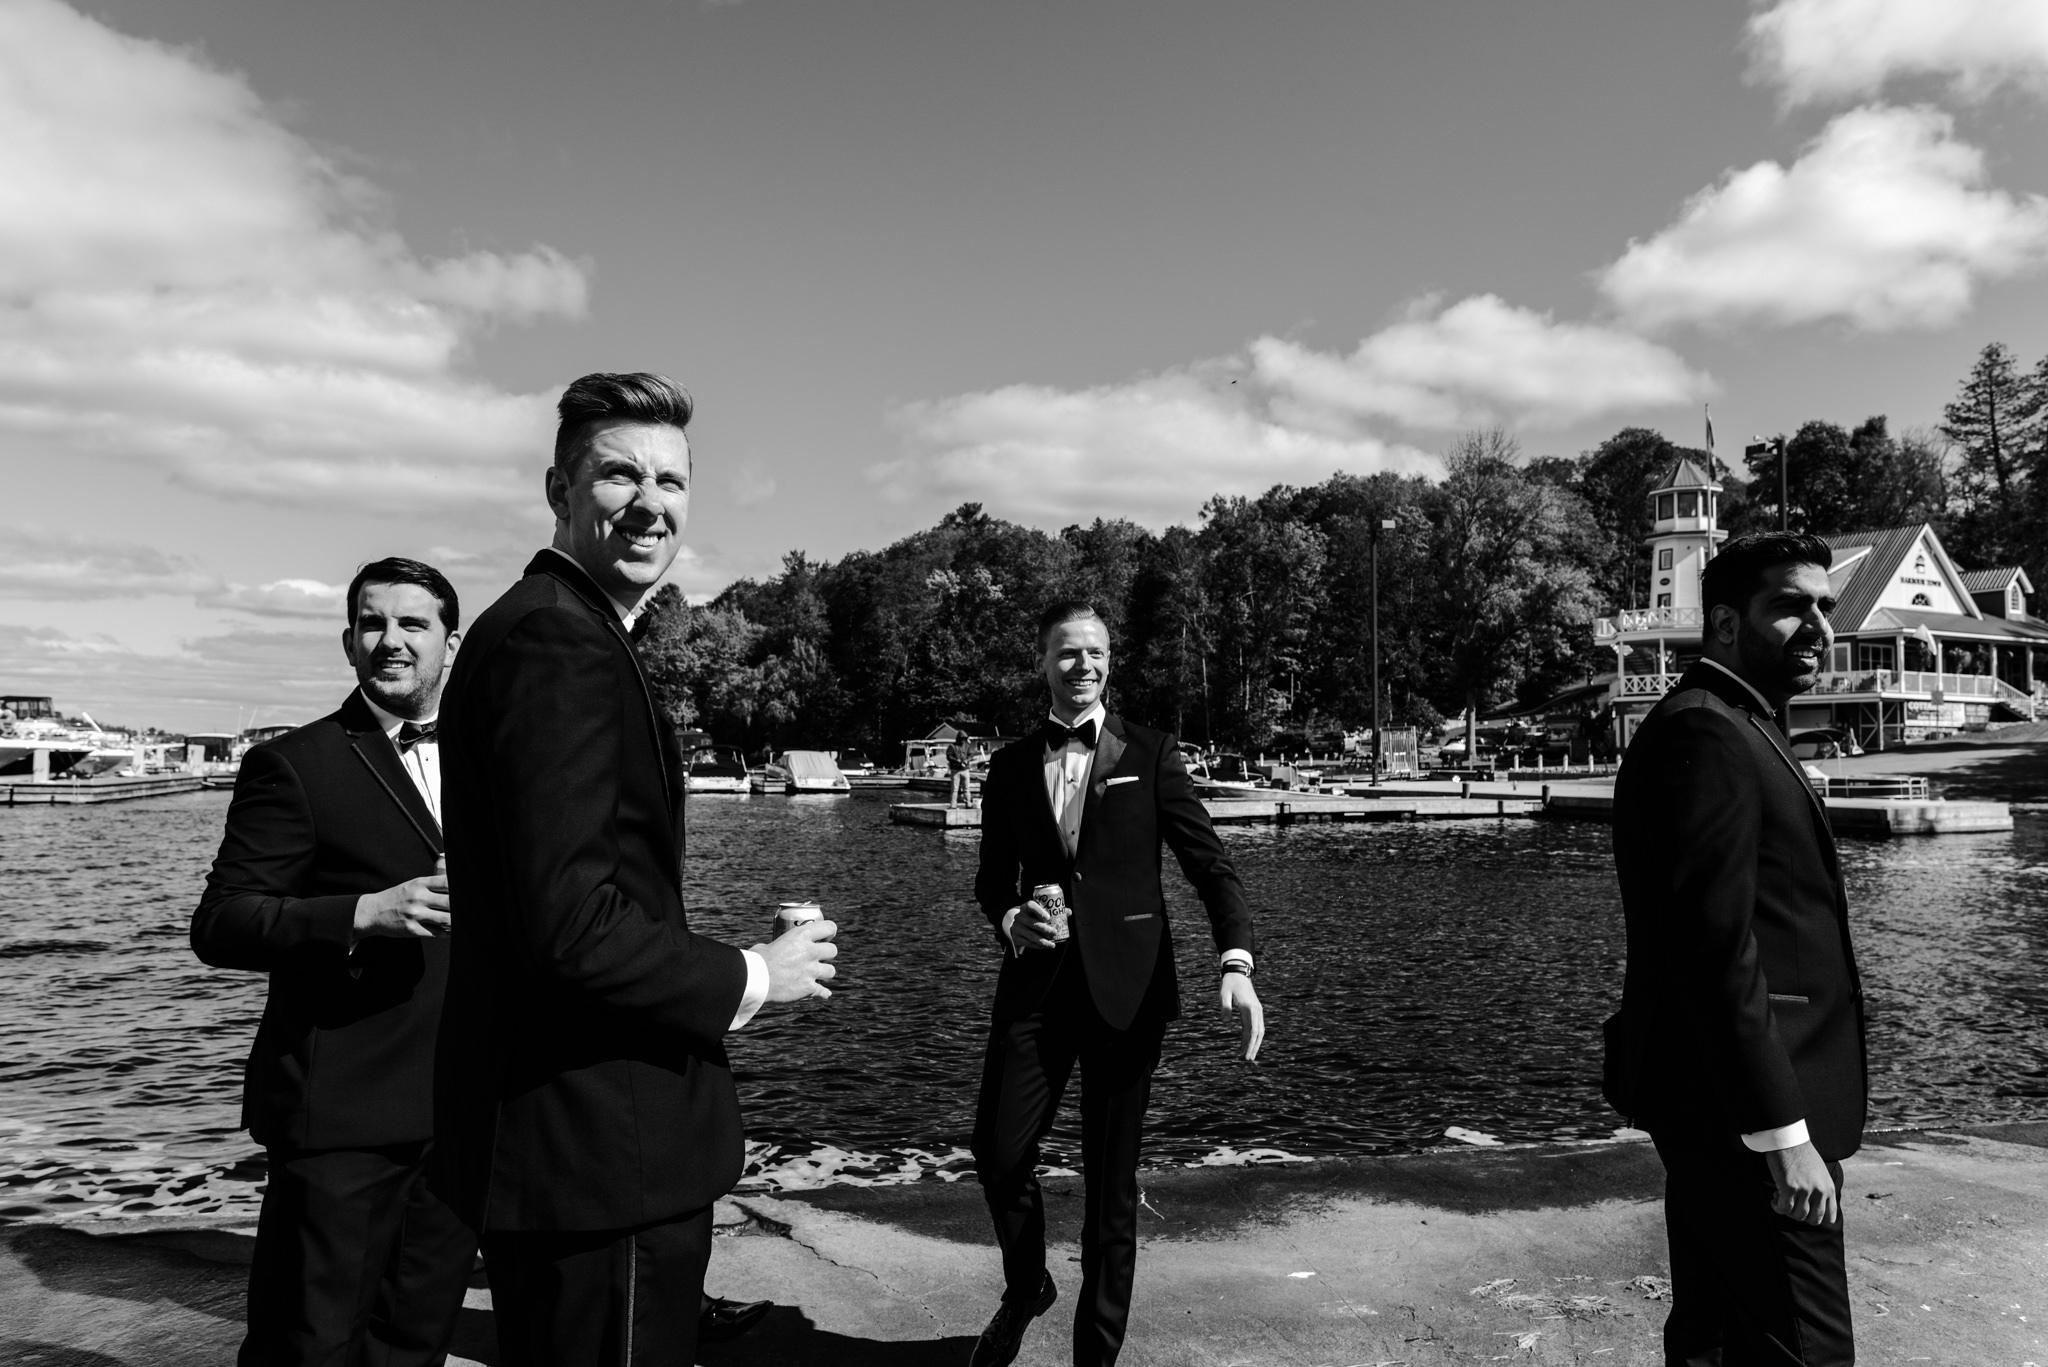 077-groomsmen-wedding-ontario-cottage-photography-toronto.jpg